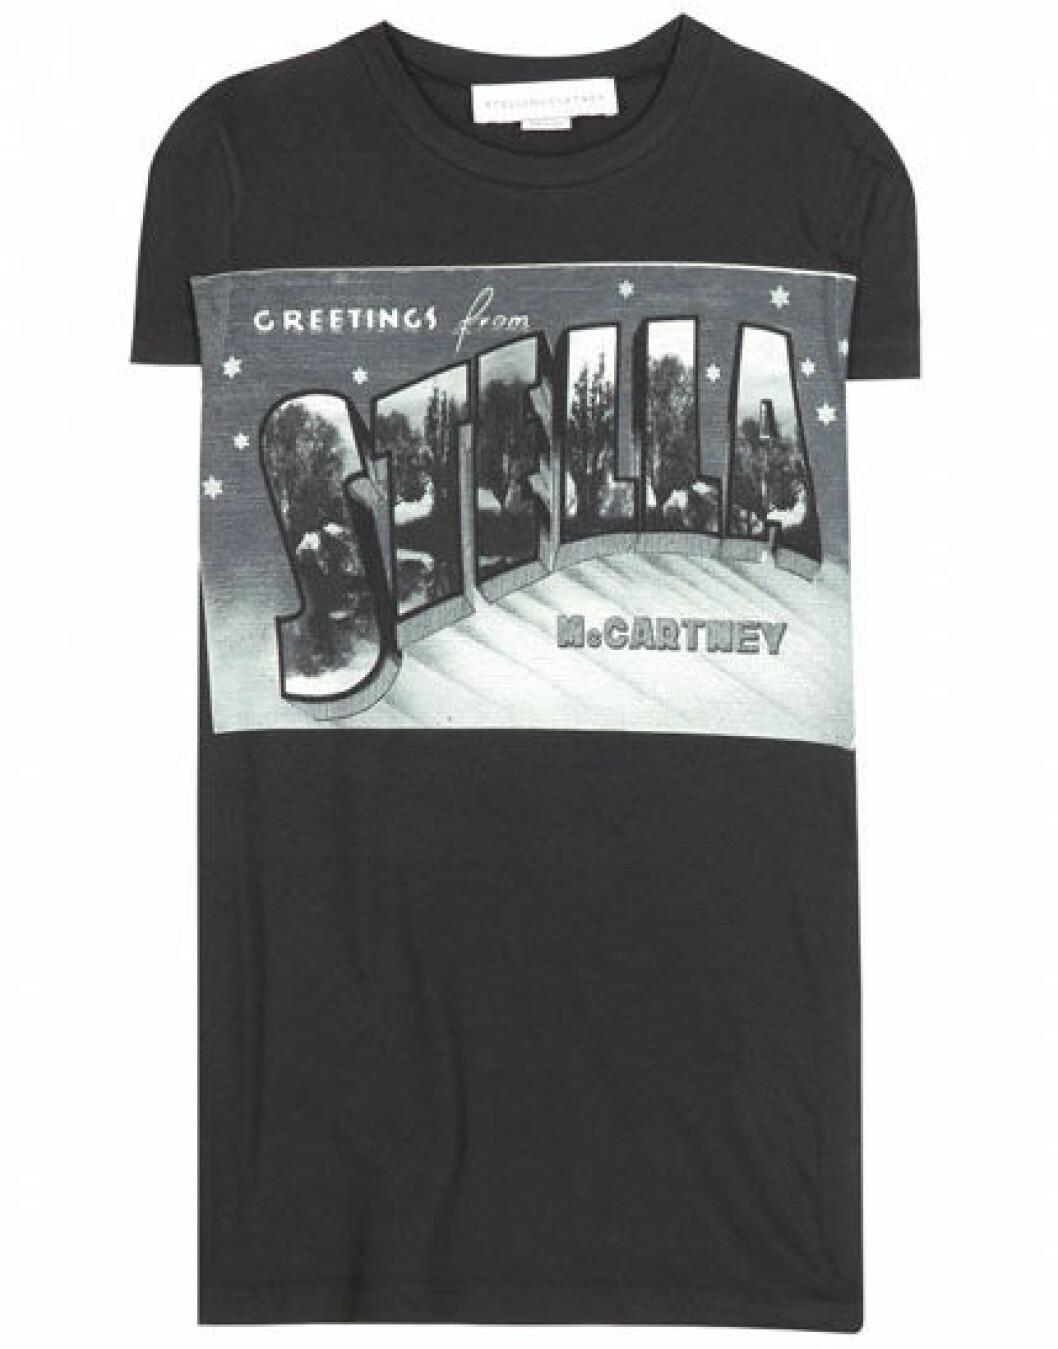 10. T-shirt, 1537 kr, Stella McCartney Mytheresa.com